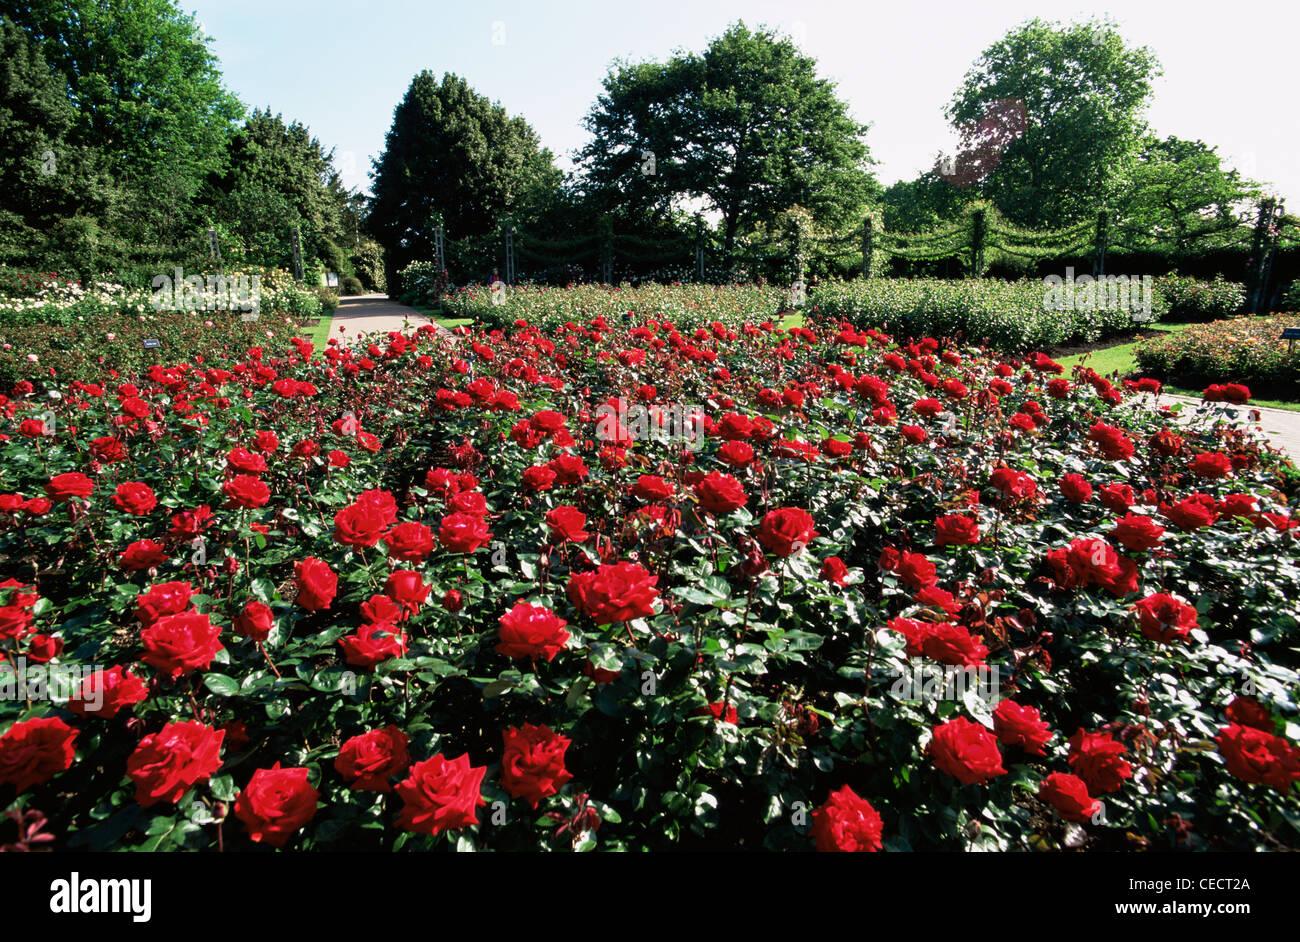 Roses In Garden: England, London, Regents Park, Queen Mary's Gardens, Rose